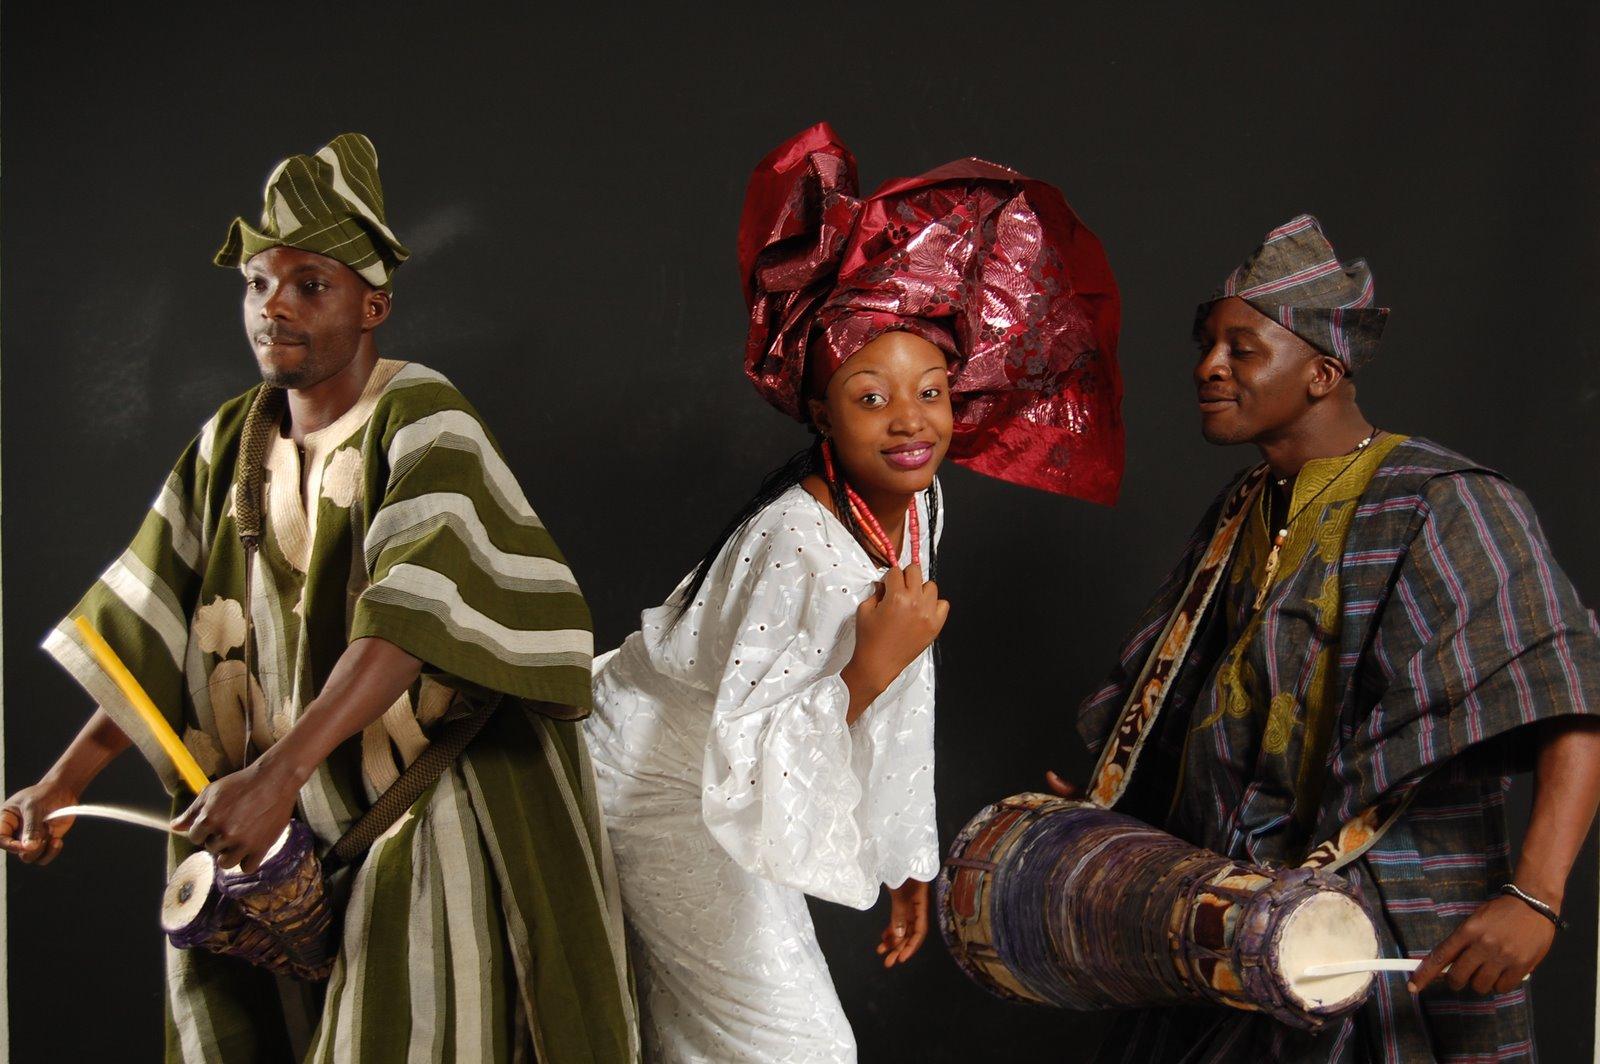 meet rich guys in nigeria the yoruba